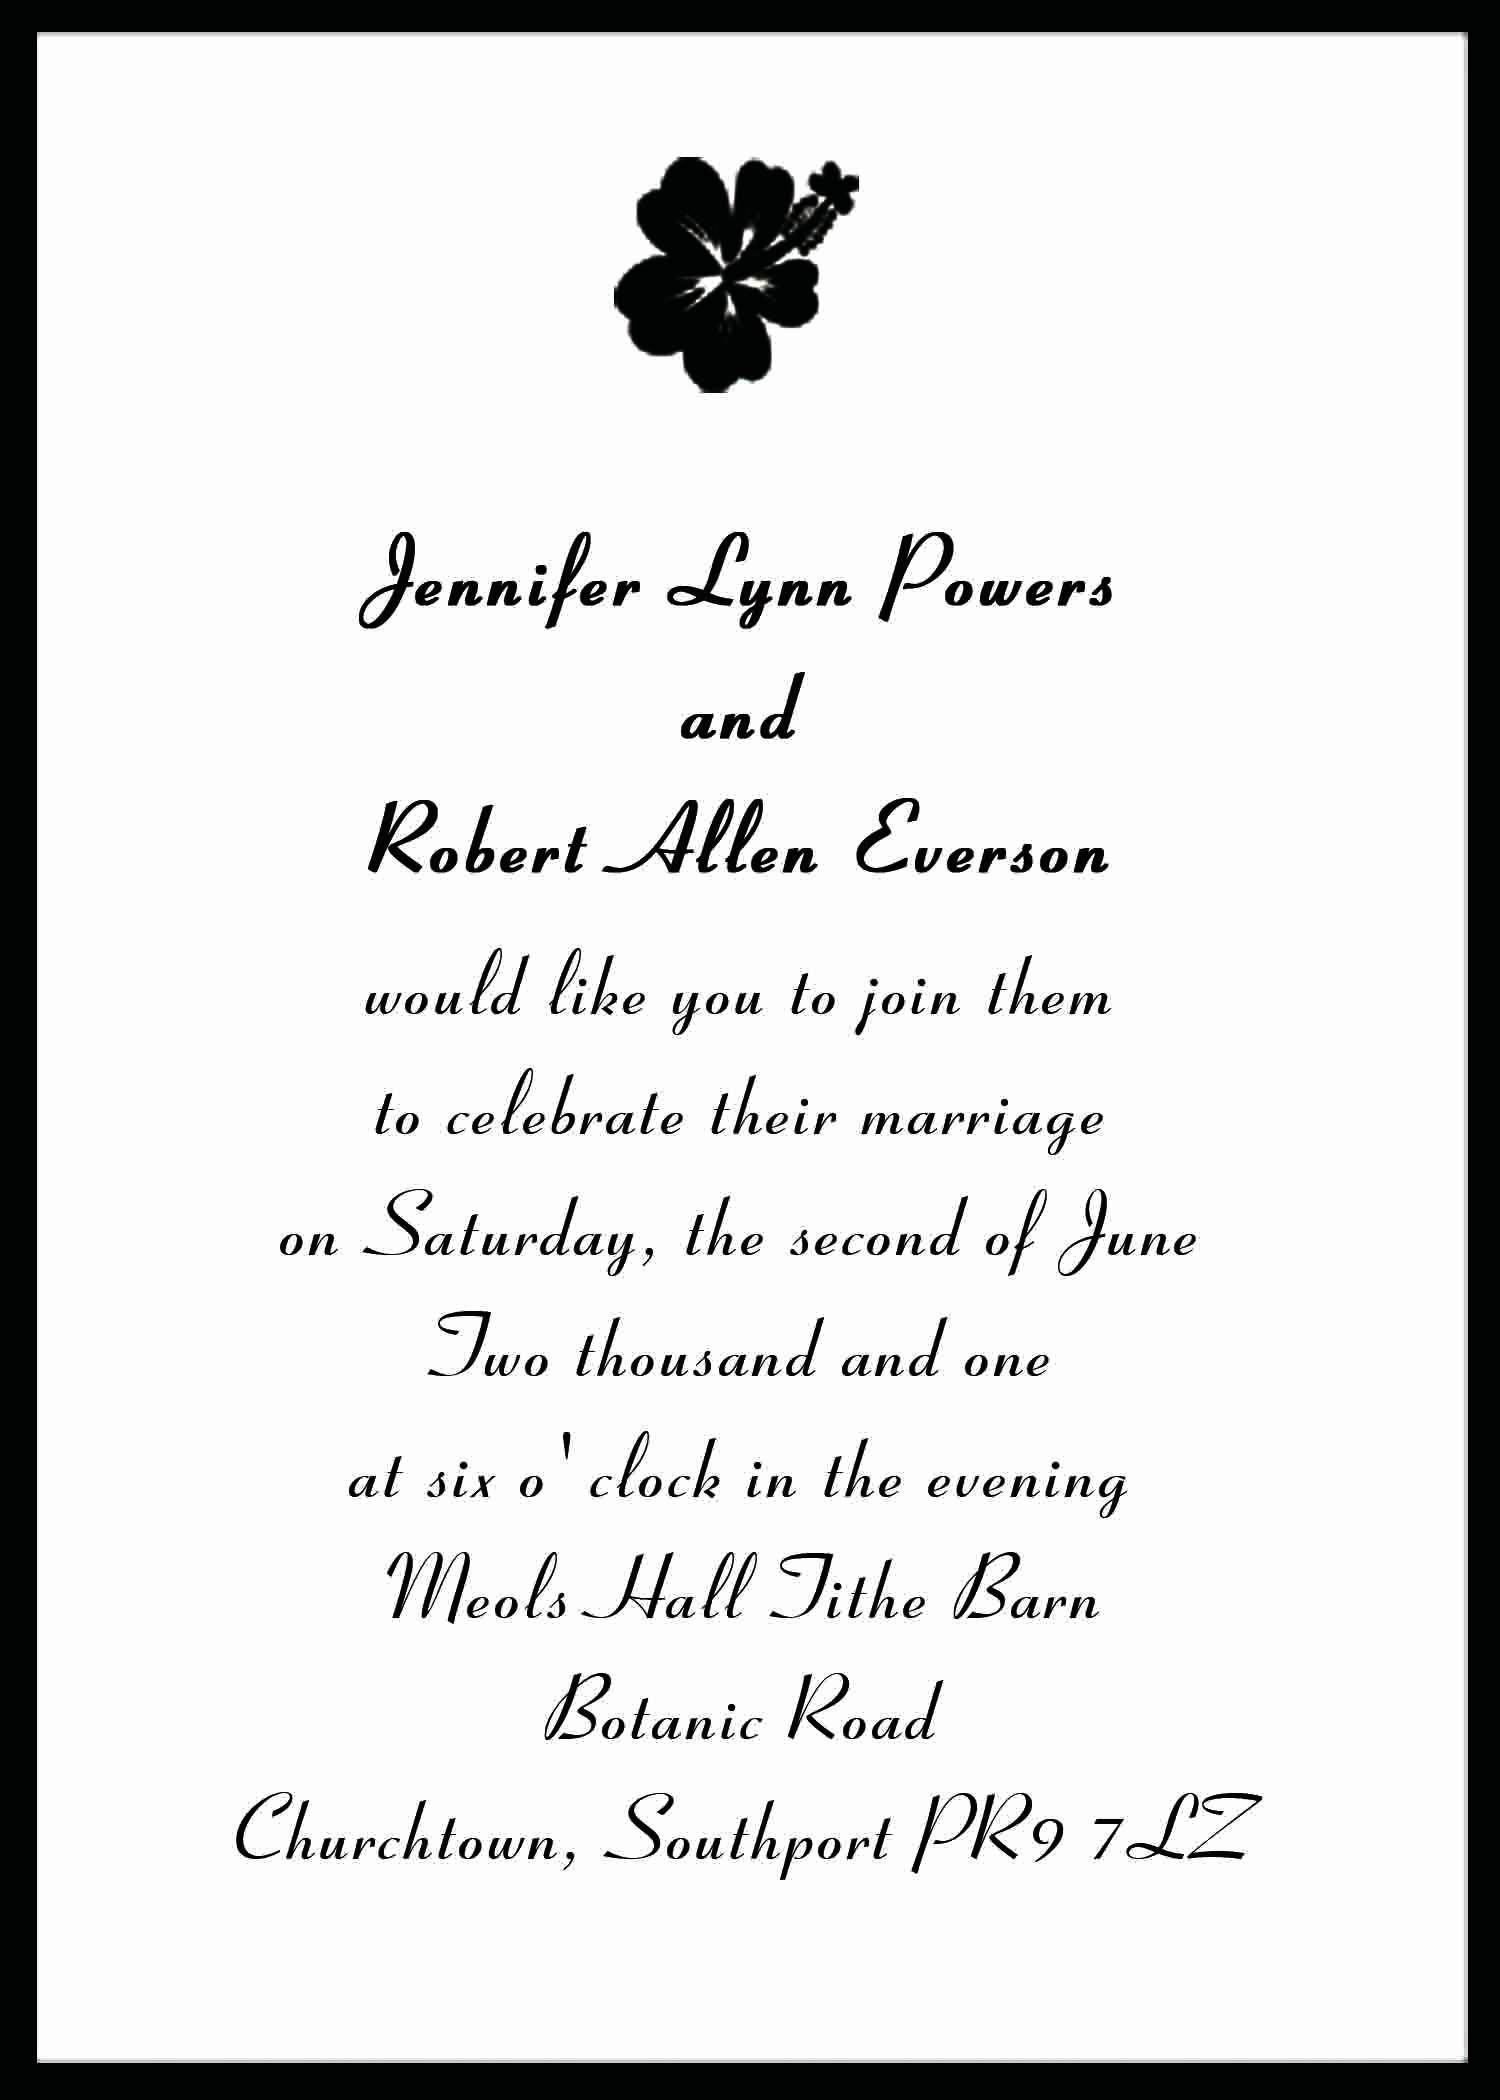 Post Wedding Shower Invitation Wording Fresh Wedding Invitation Creative Wedding Invitation Wording